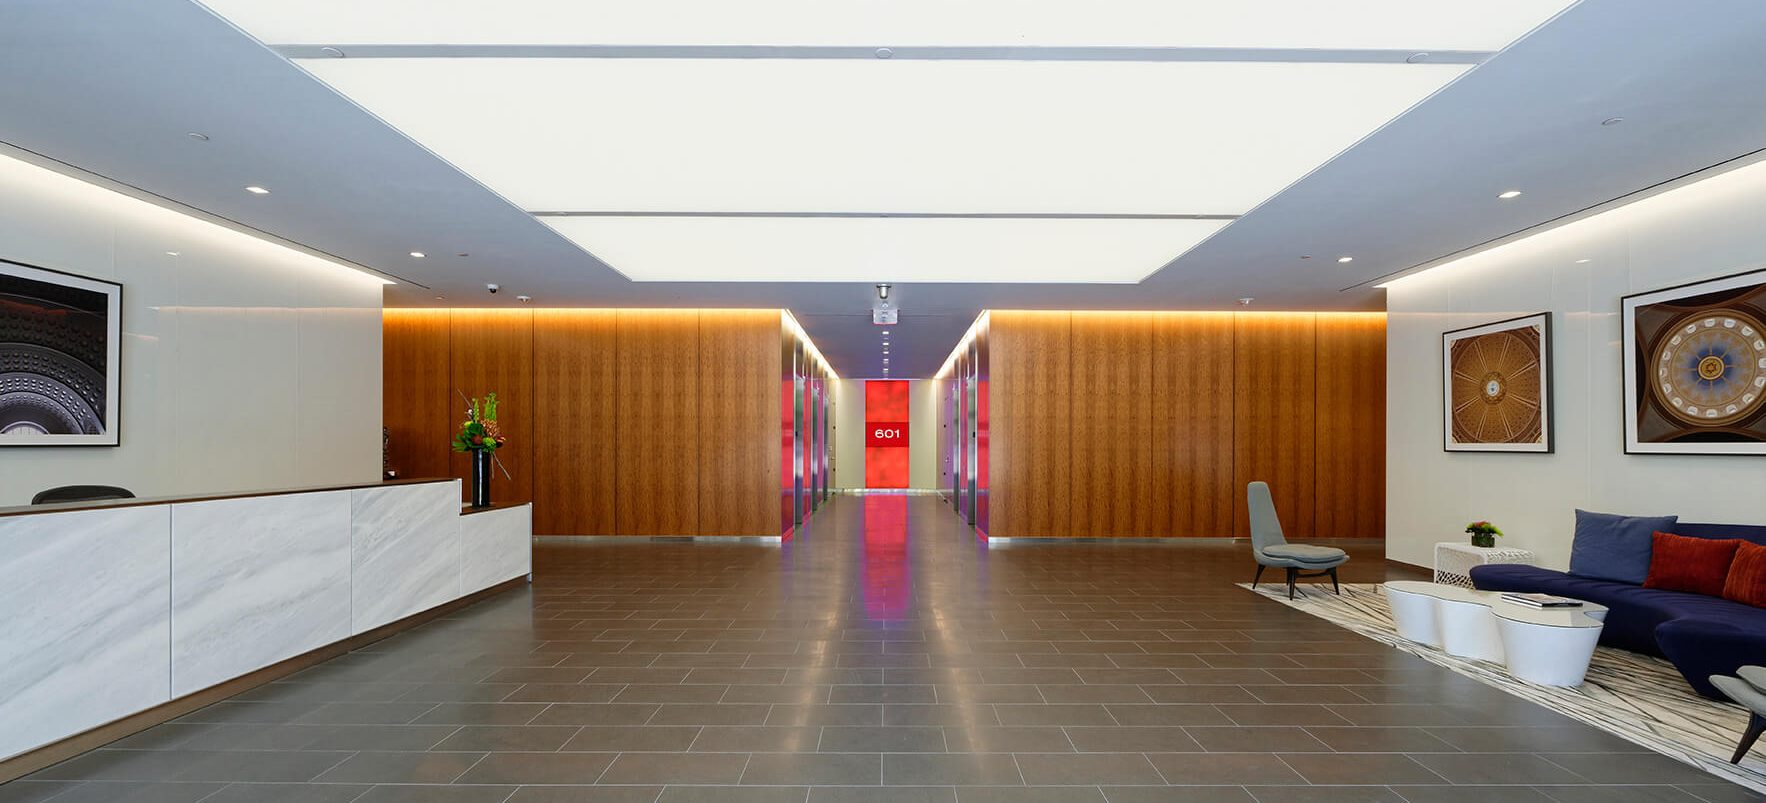 601 New Jersey Avenue lobby